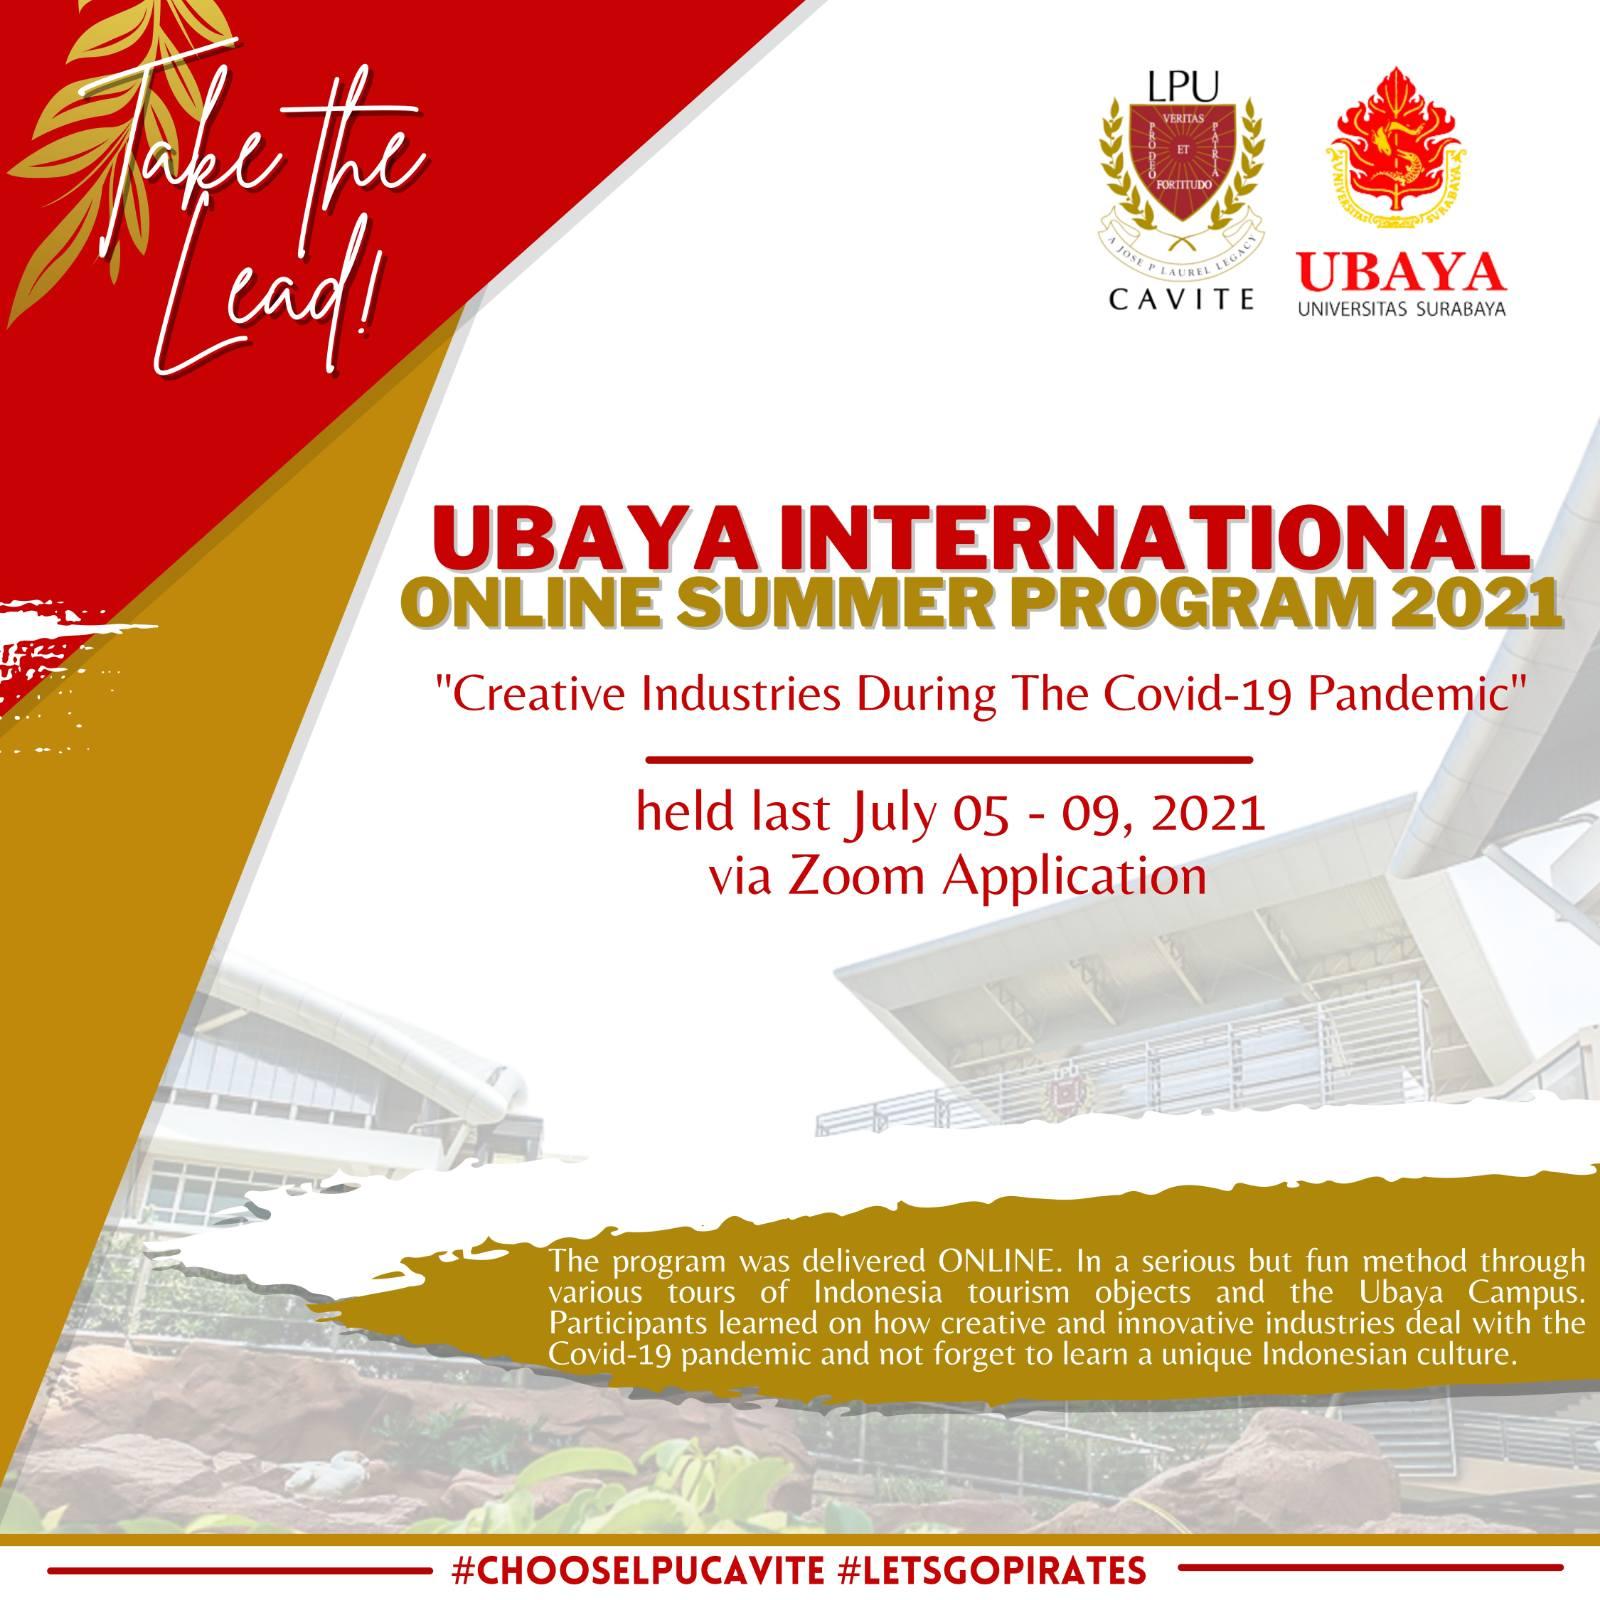 CITHM Students Goes to Ubaya through an Online Summer Program